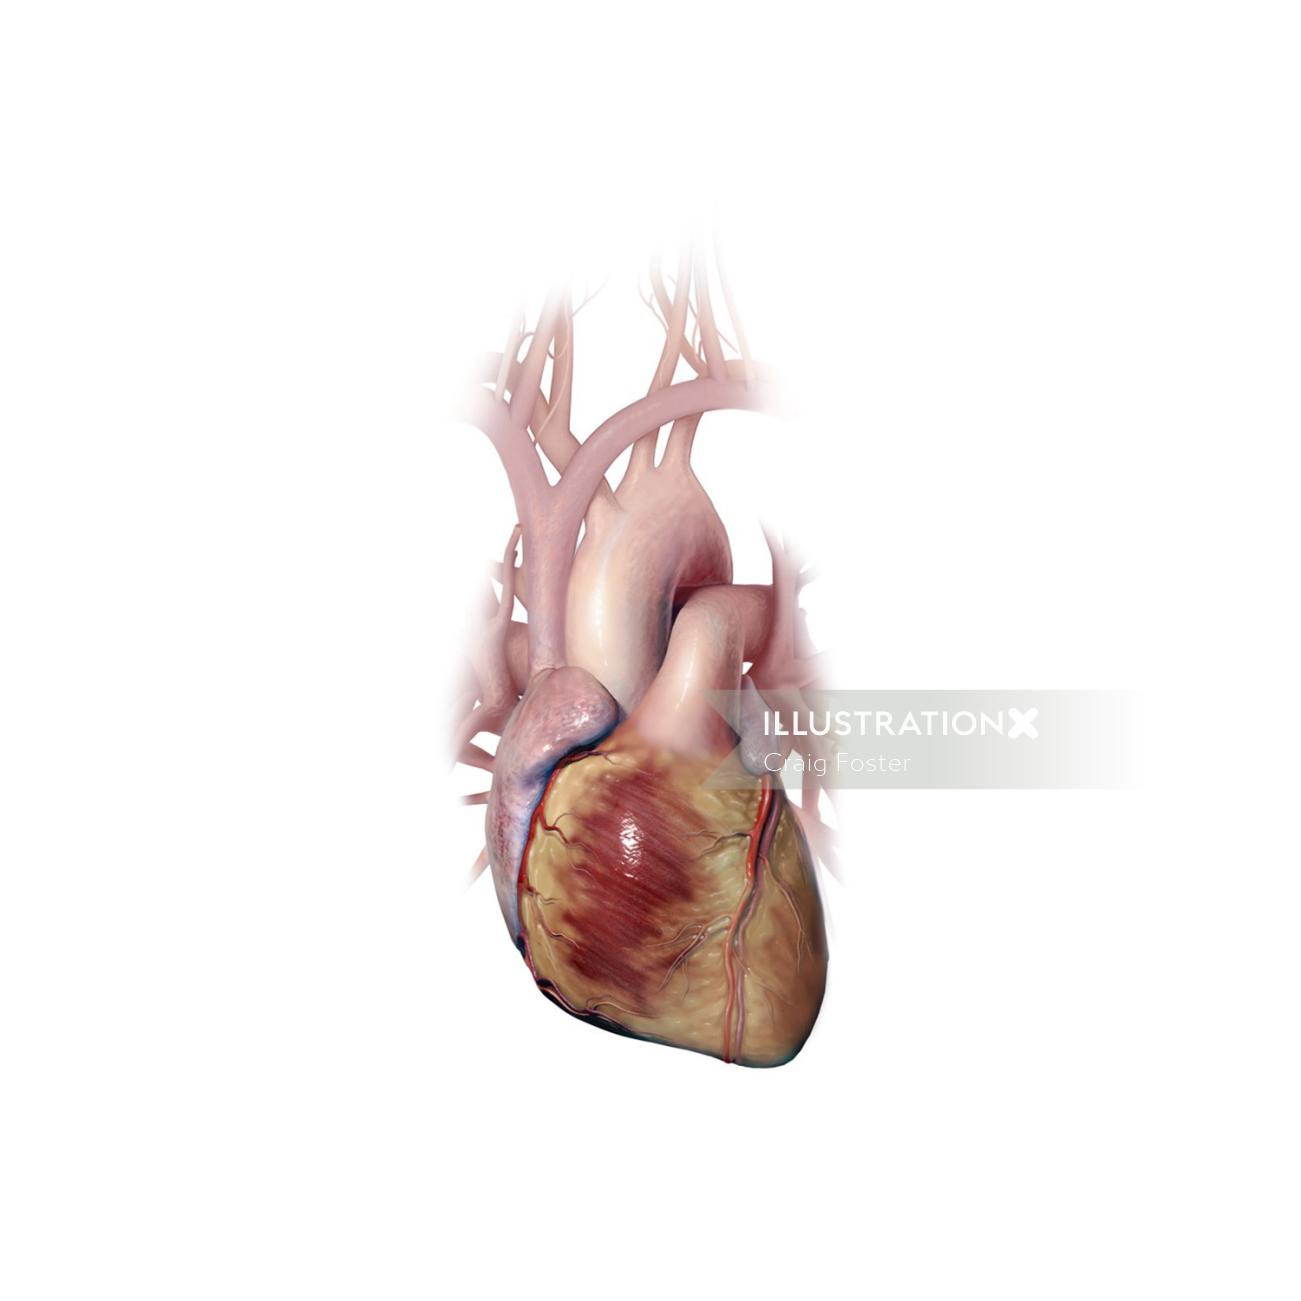 Heart illustration | Medical illustration collection